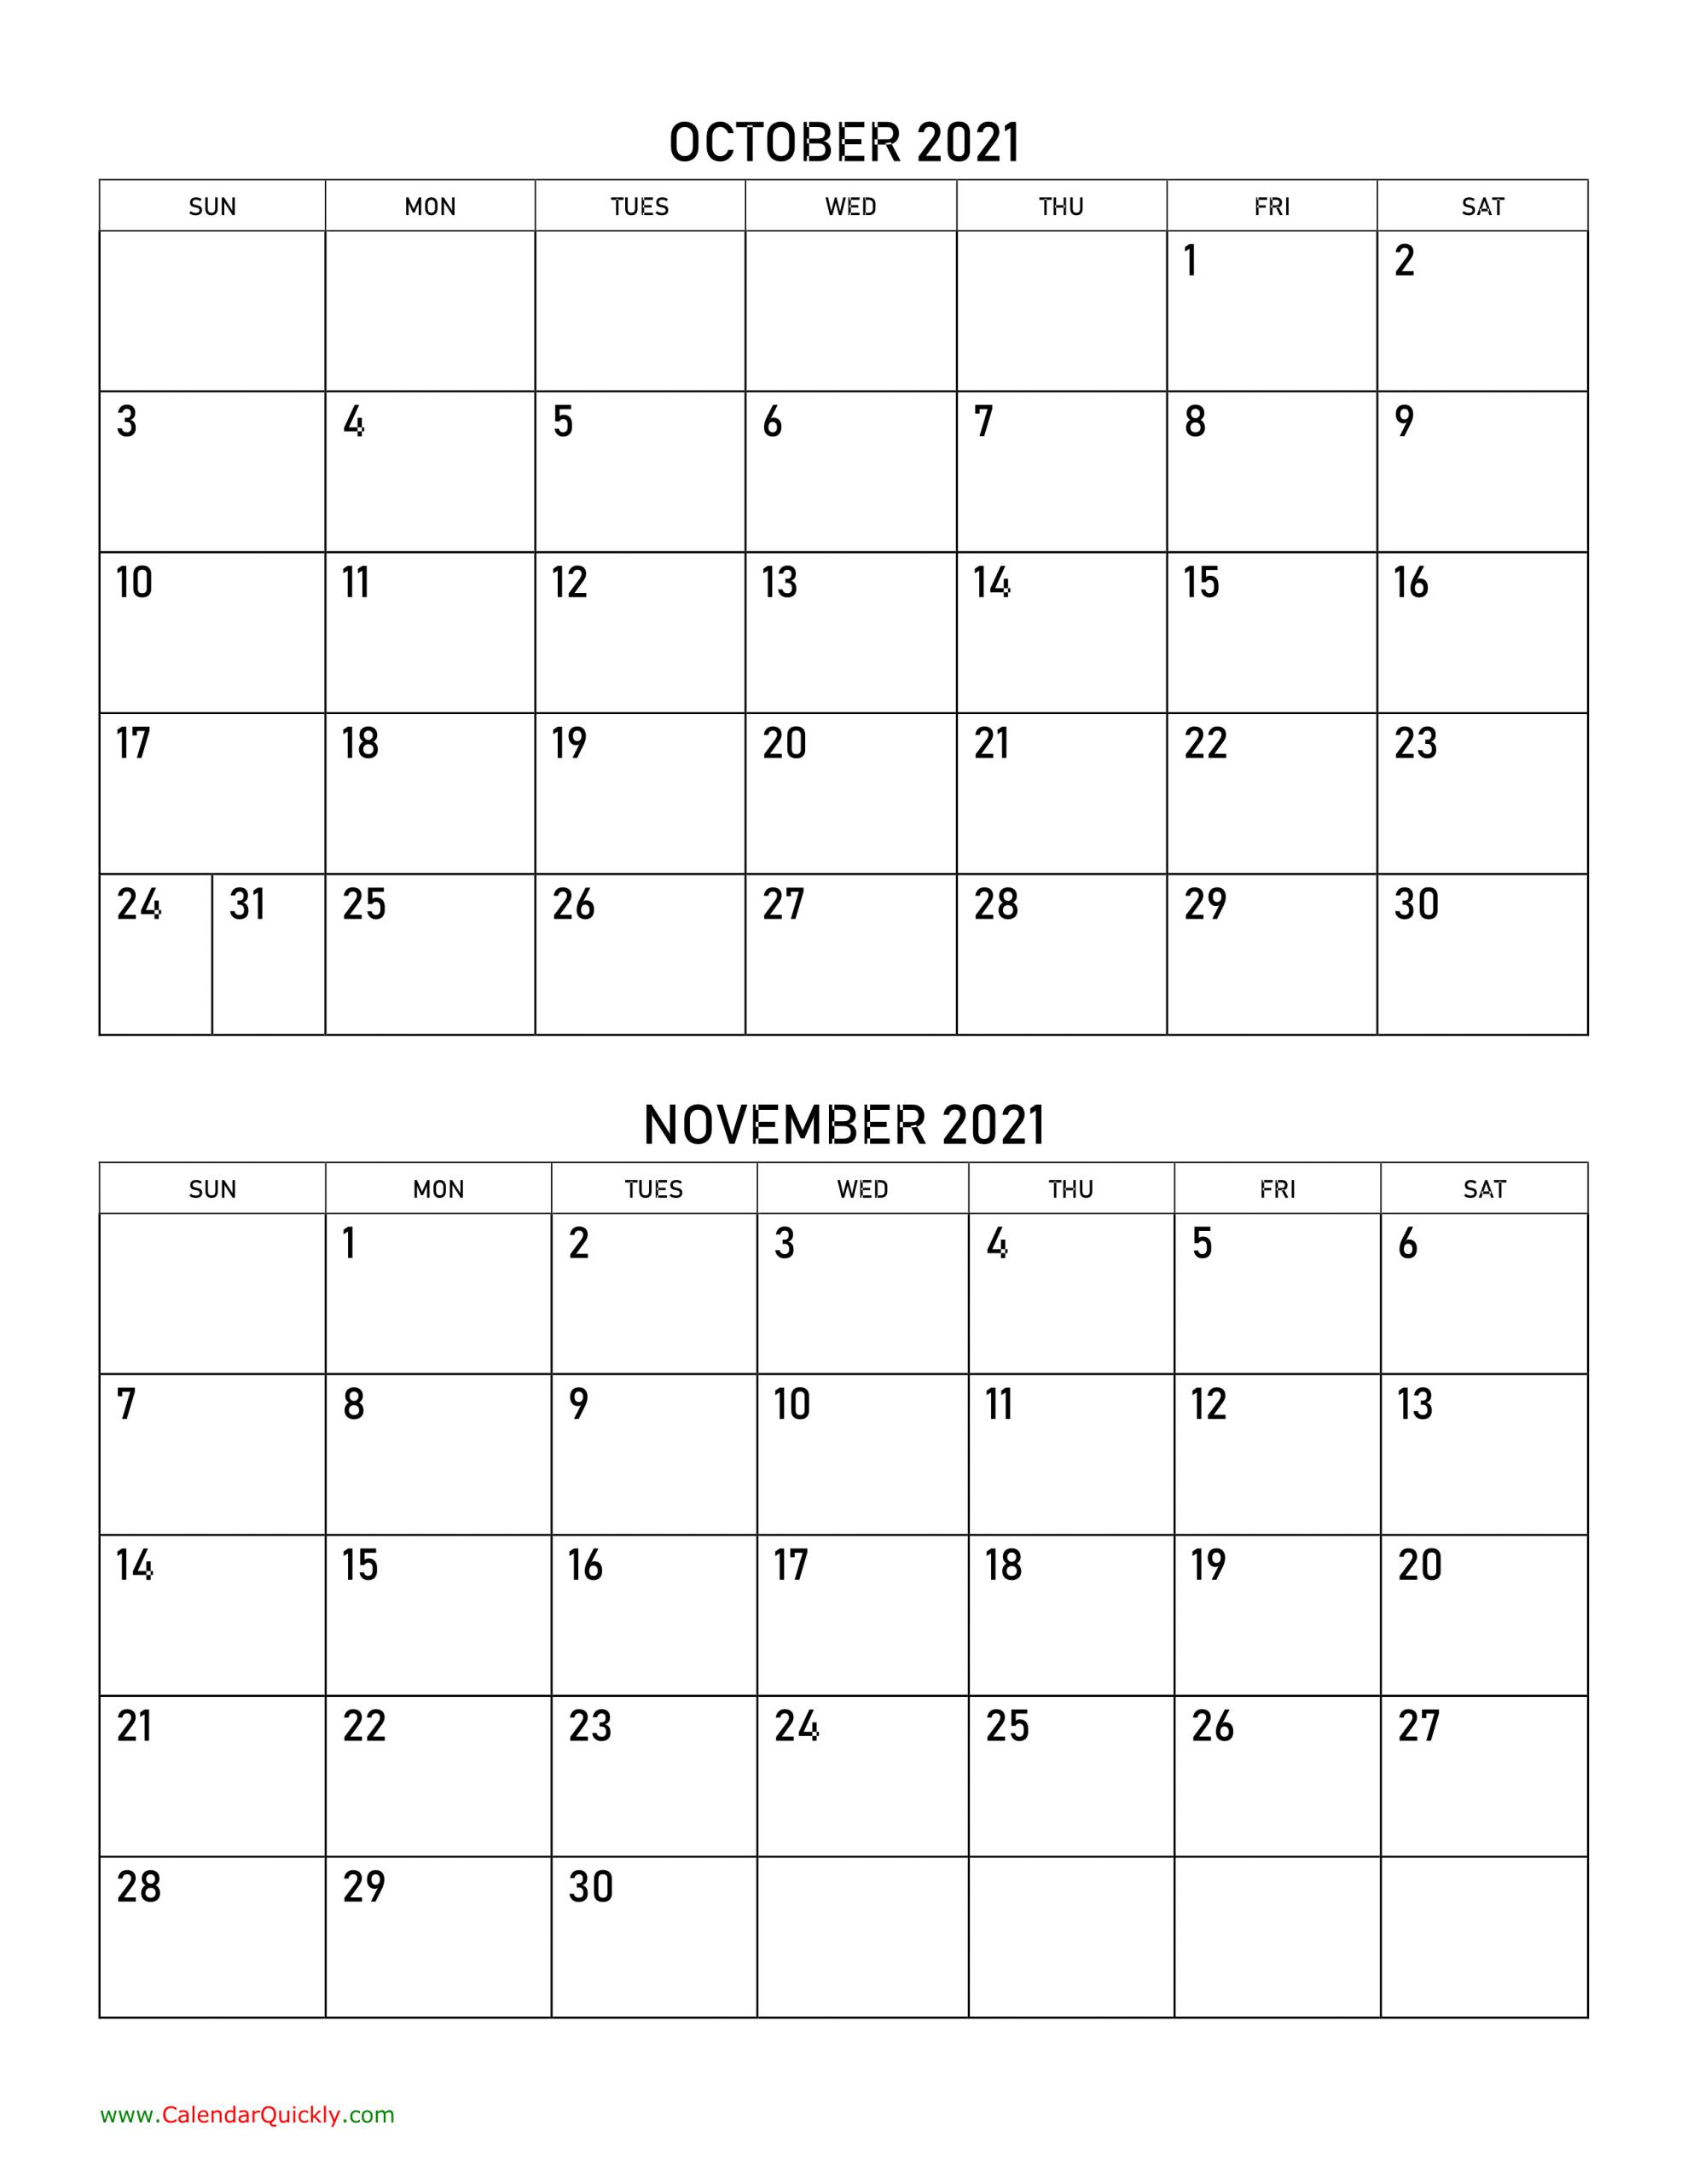 October And November 2021 Calendar Calendar Quickly